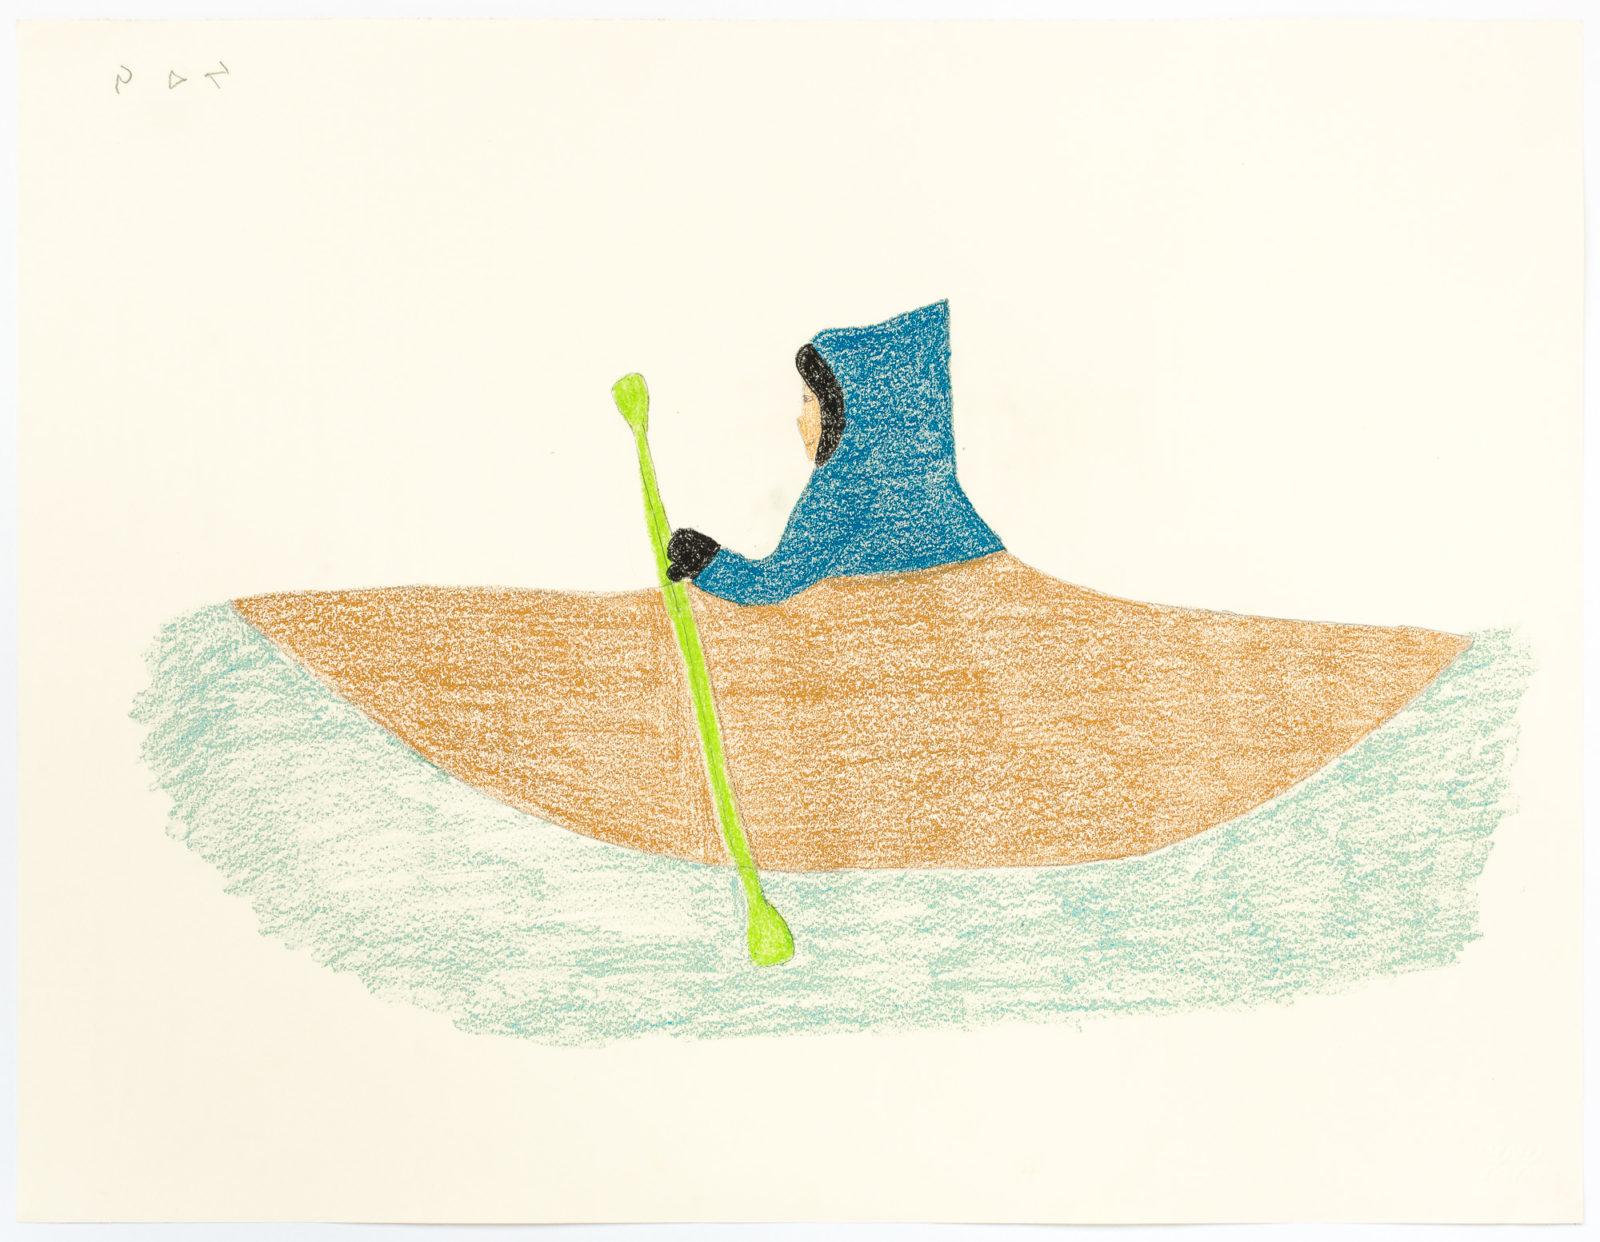 Sheojuk Etidlooie - untitled (kayaker)